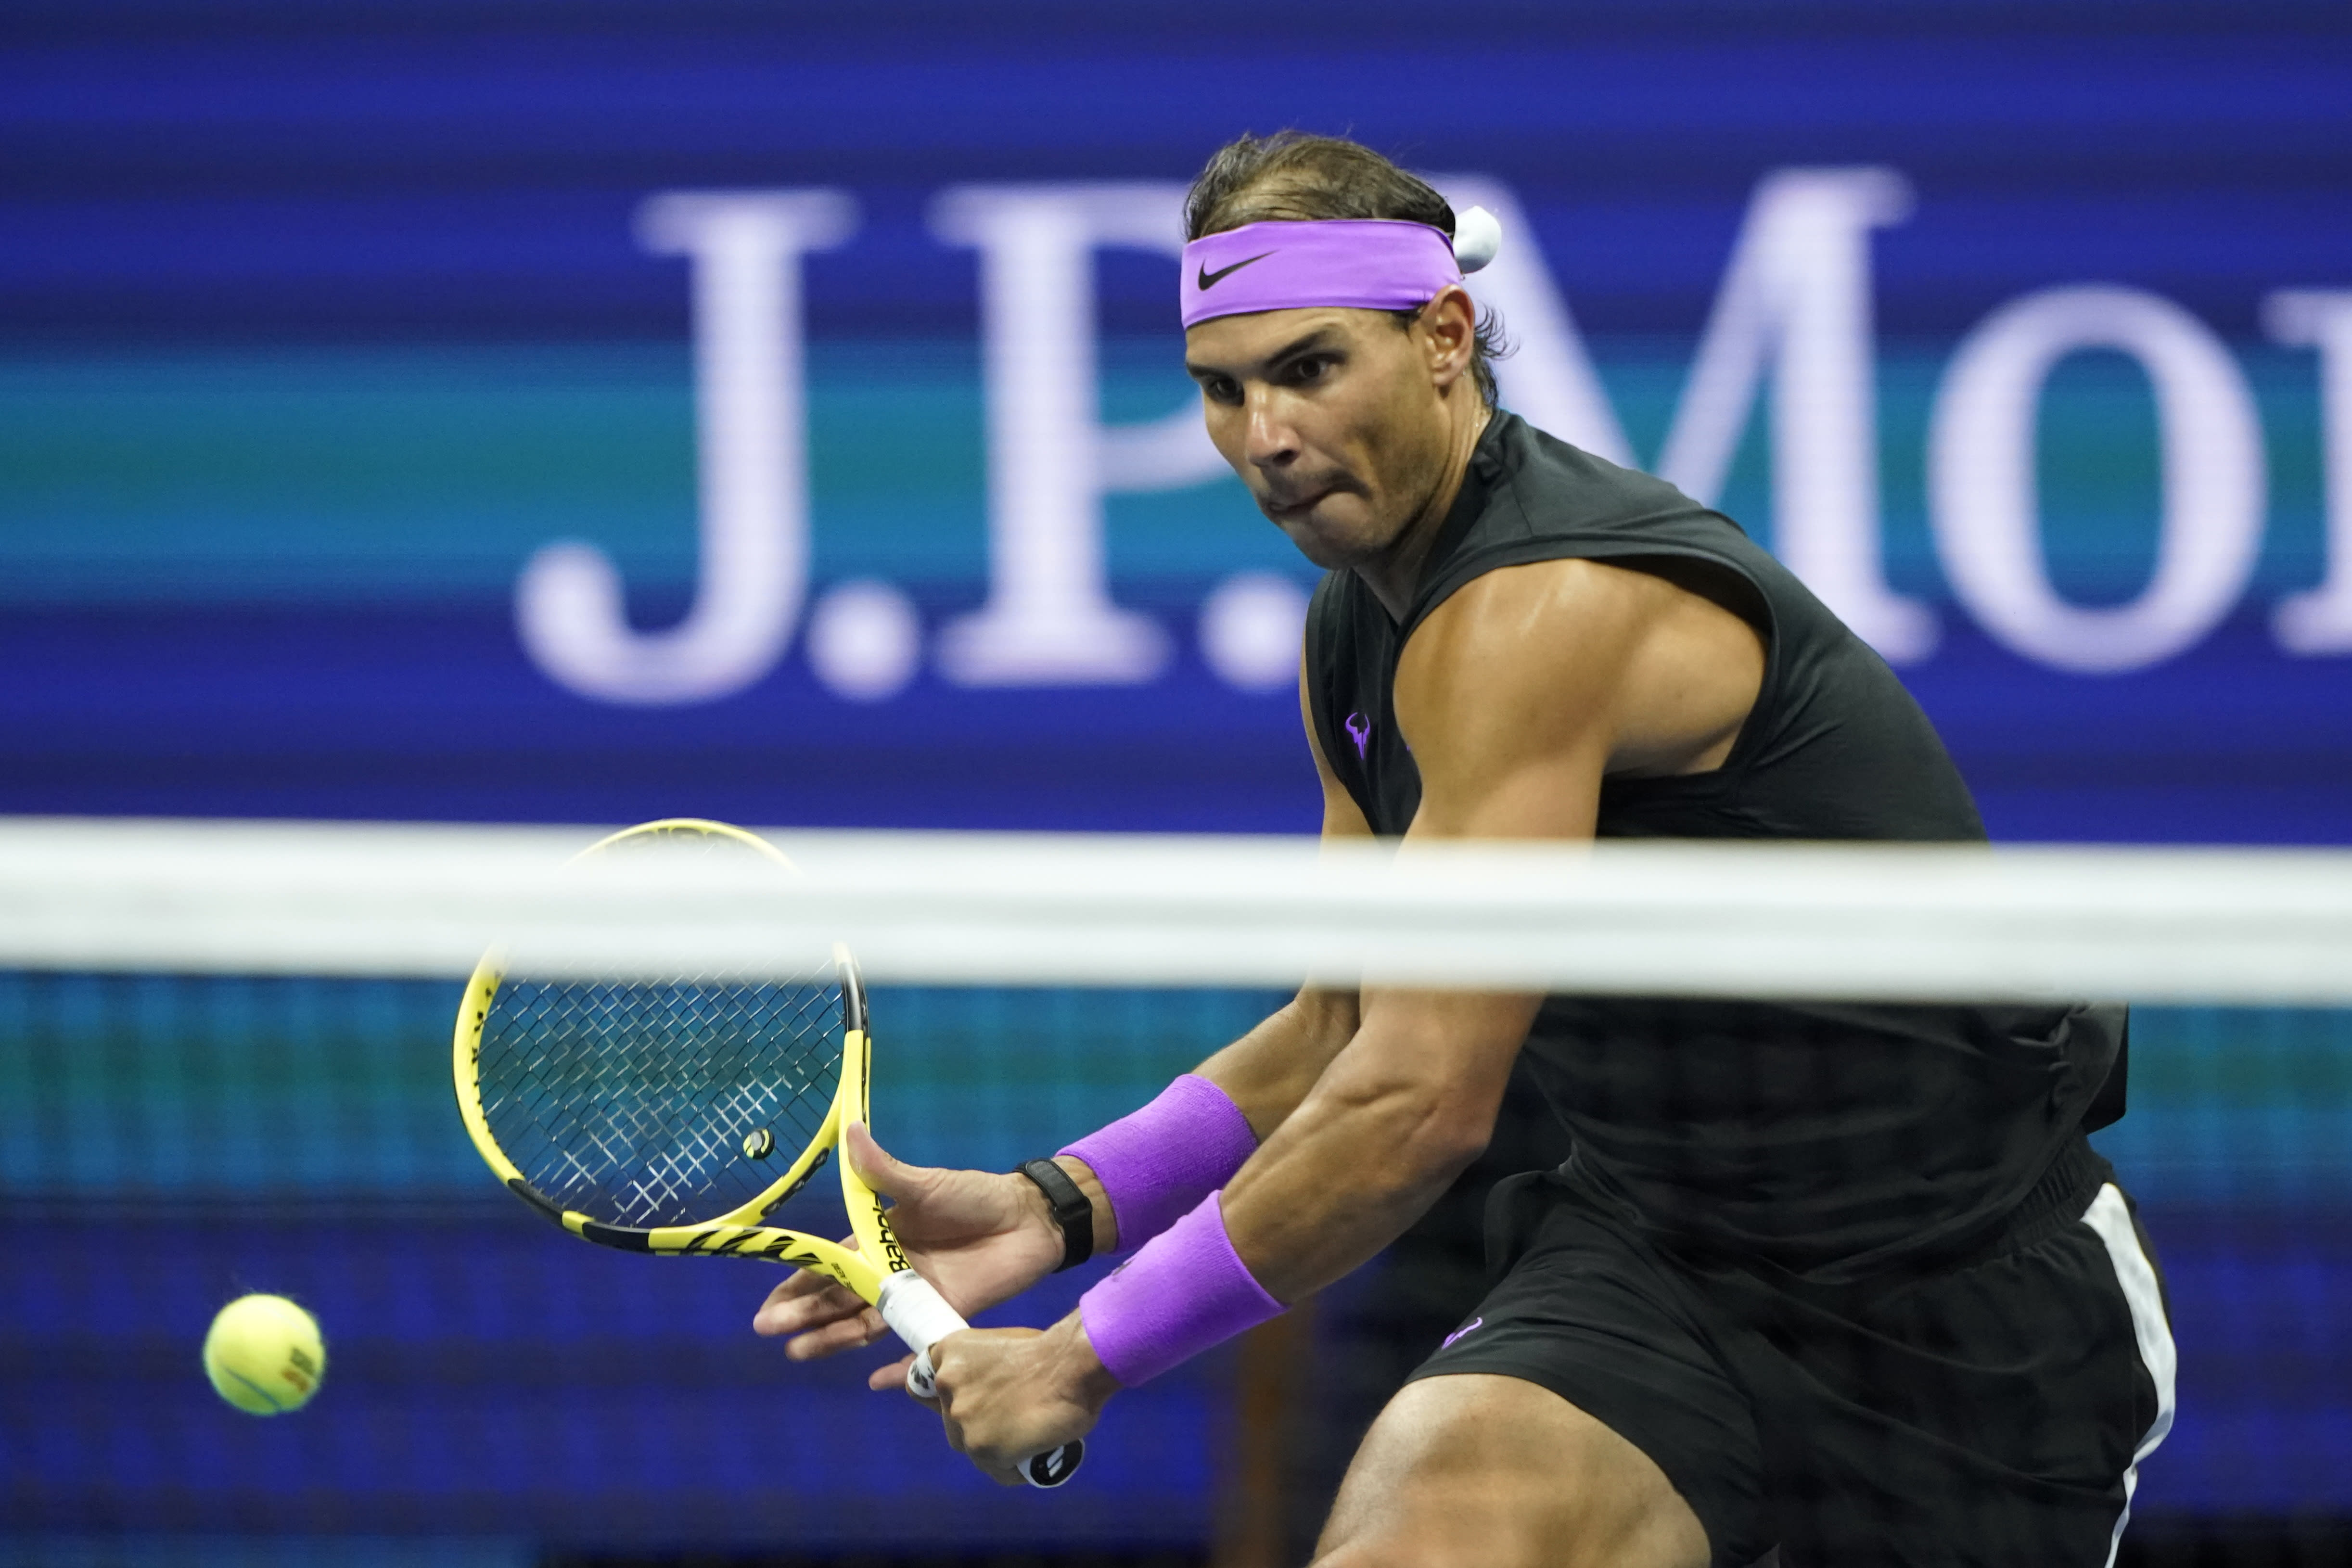 Rafael Nadal, of Spain, returns a shot to Matteo Berrettini, of Italy, during the men's singles semifinals of the U.S. Open tennis championships Friday, Sept. 6, 2019, in New York. (AP Photo/Eduardo Munoz Alvarez)